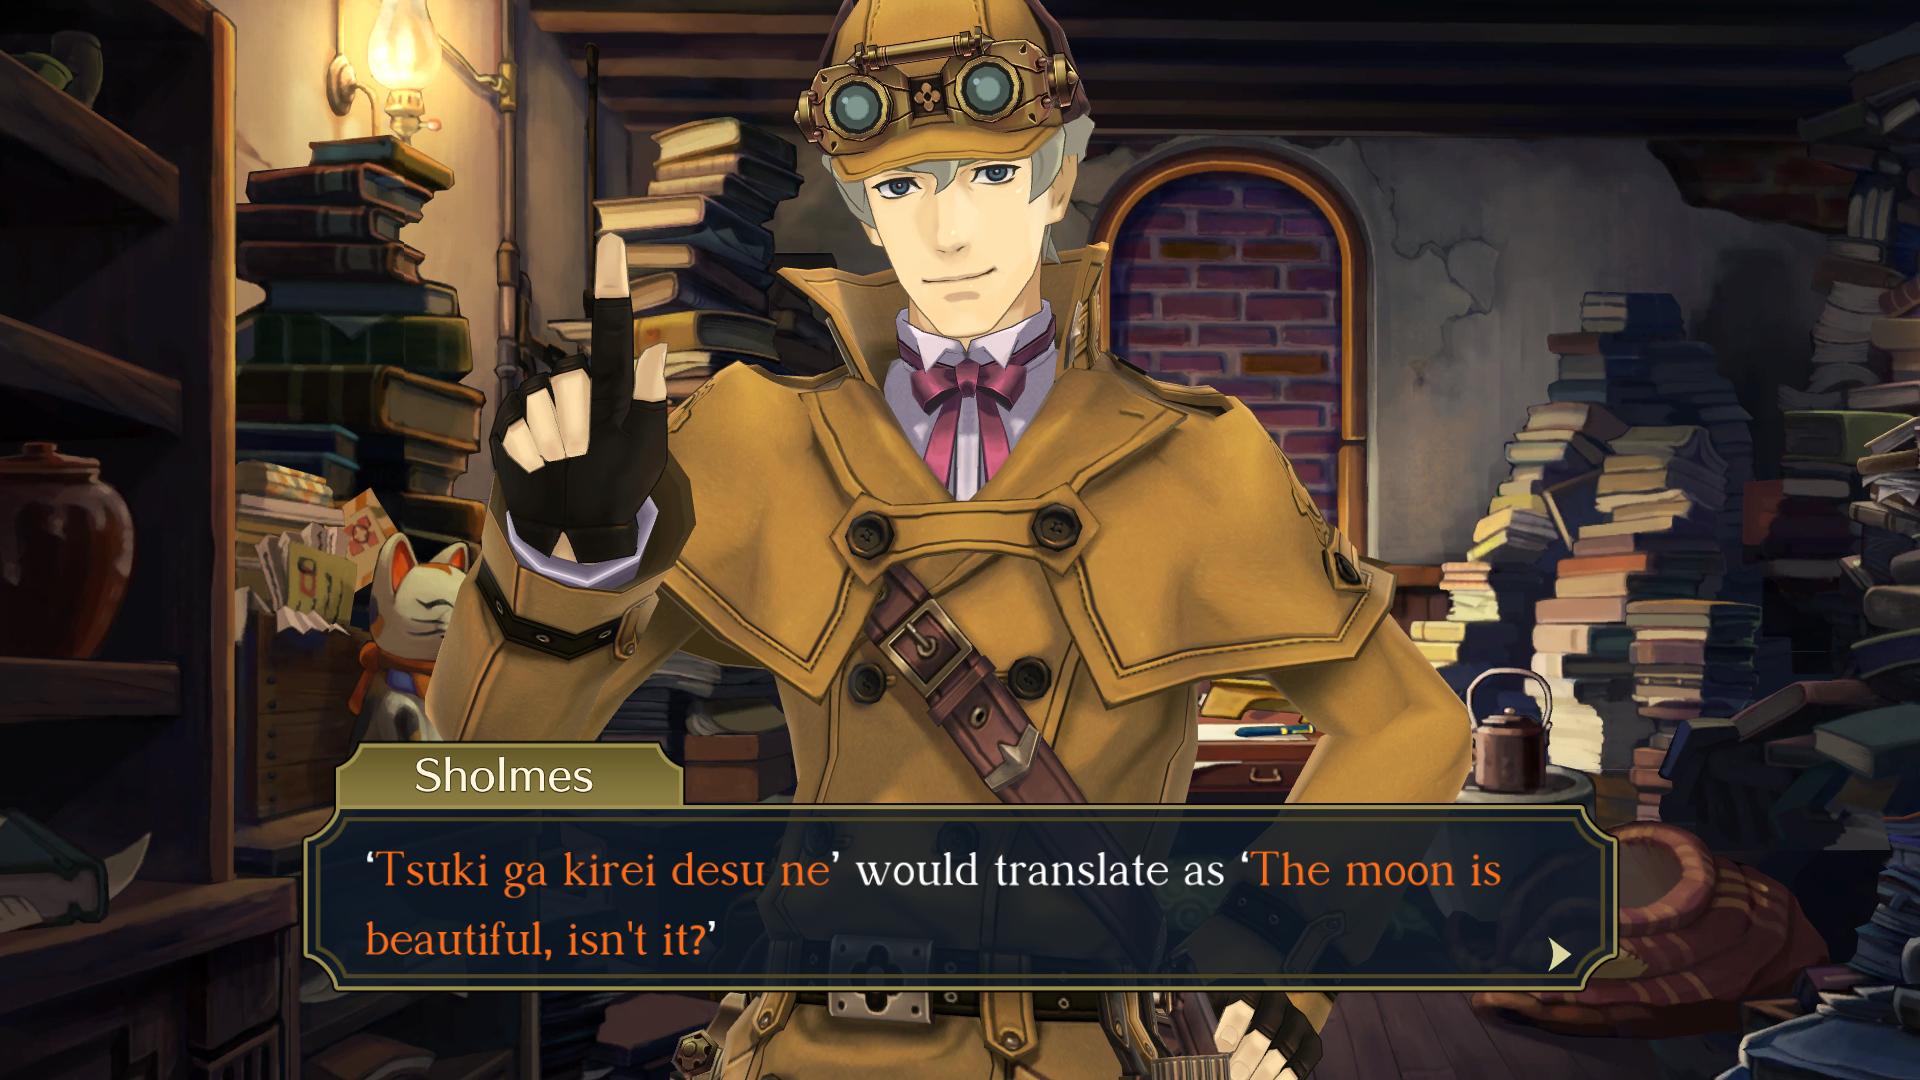 "The Great Ace Attorney Chronicles - Sholmes says: ""'Tsuki ga kirei desu ne' would translate as 'The moon is beautiful, isn't it?'"""